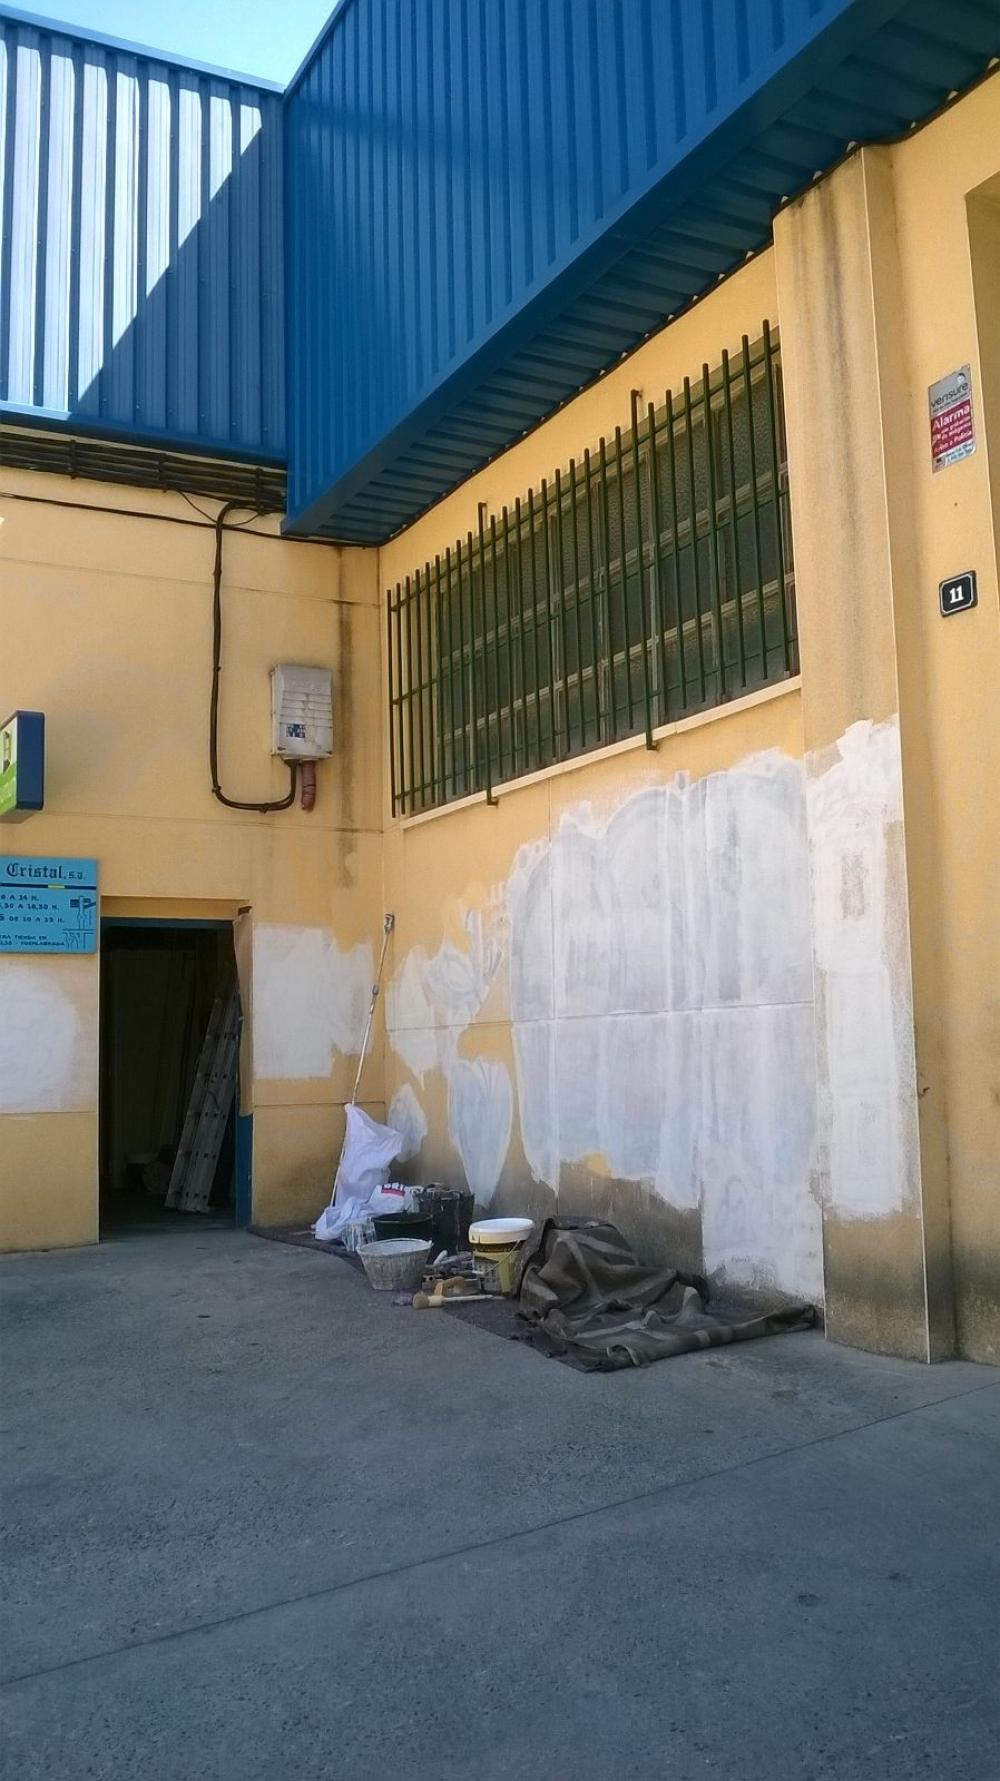 Empresa pintores madrid stunning pintores empresa madrid - Empresa de pintura madrid ...